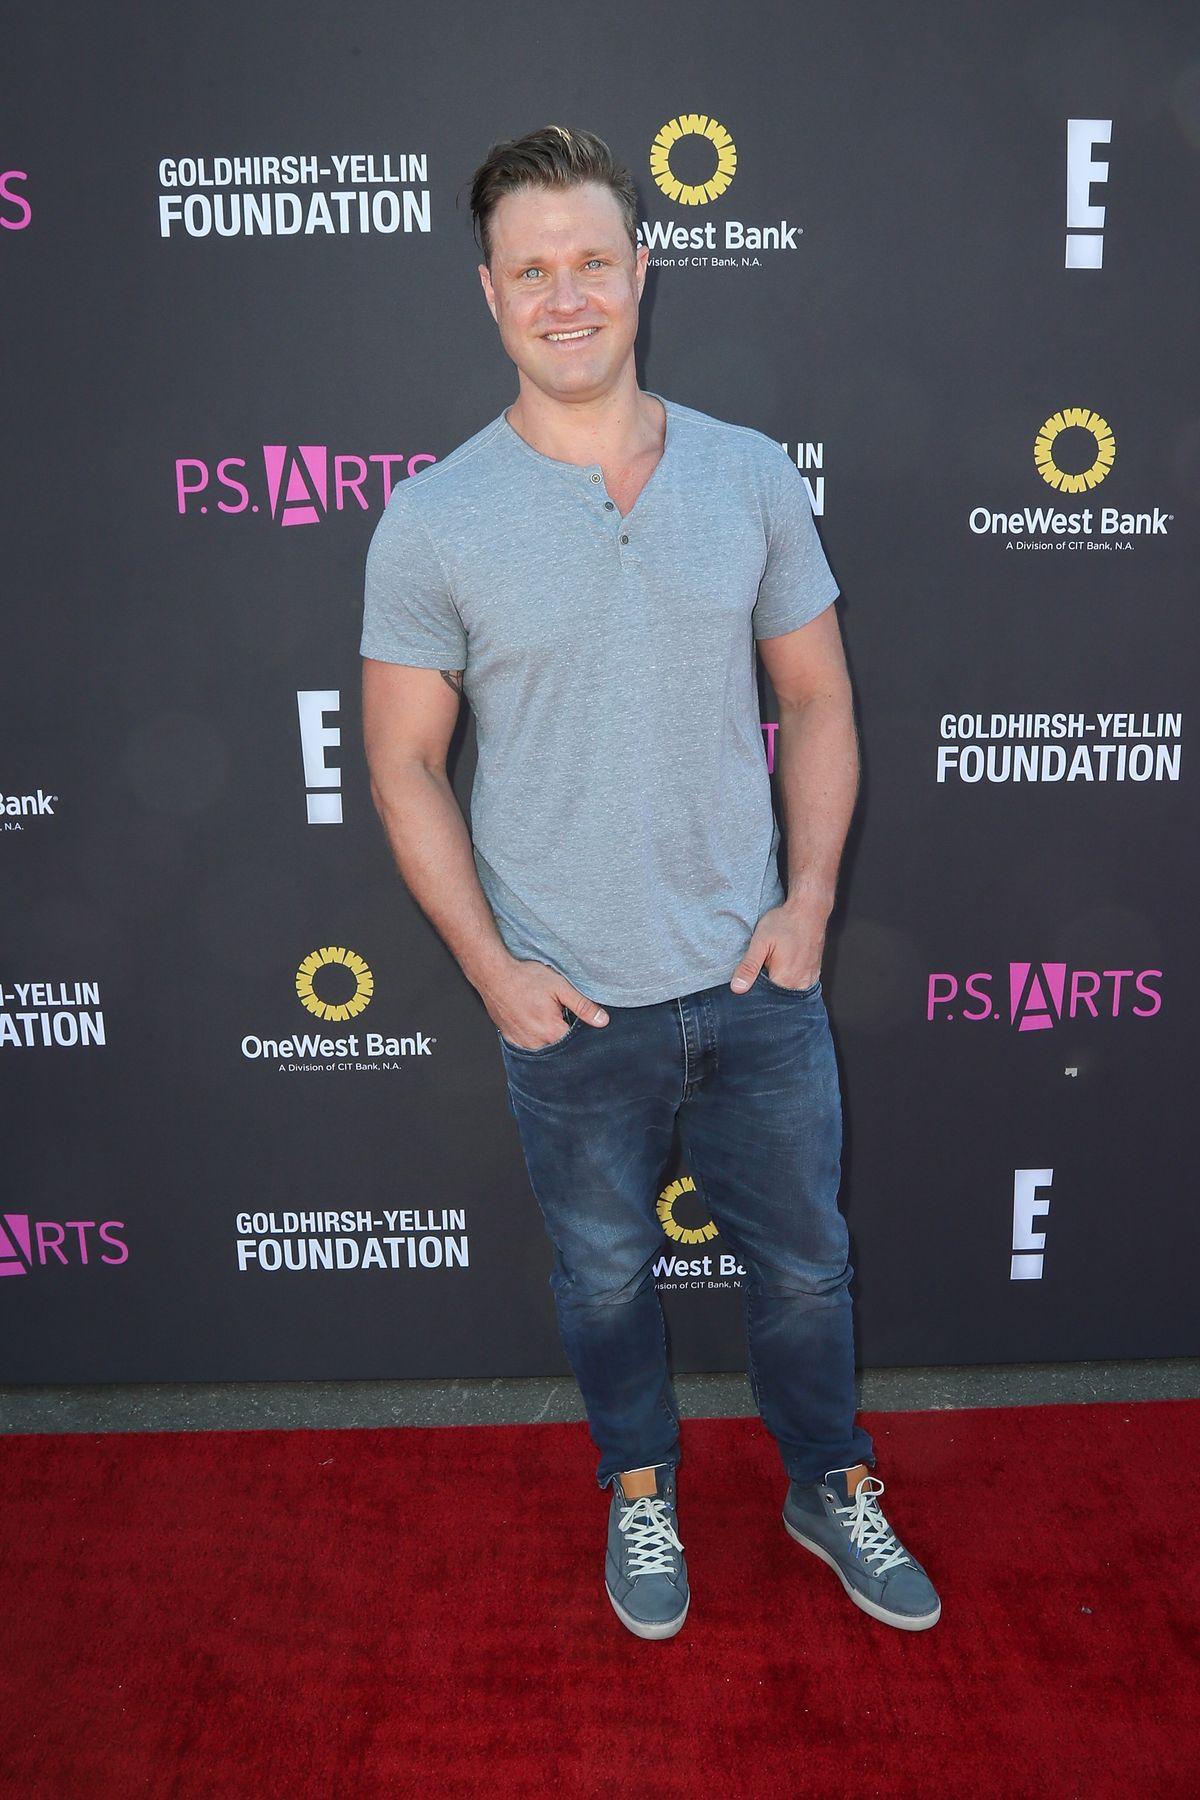 Actor Zachery Ty Bryan appears in a Nov. 13, 2016, file photo in Santa Monica, California.